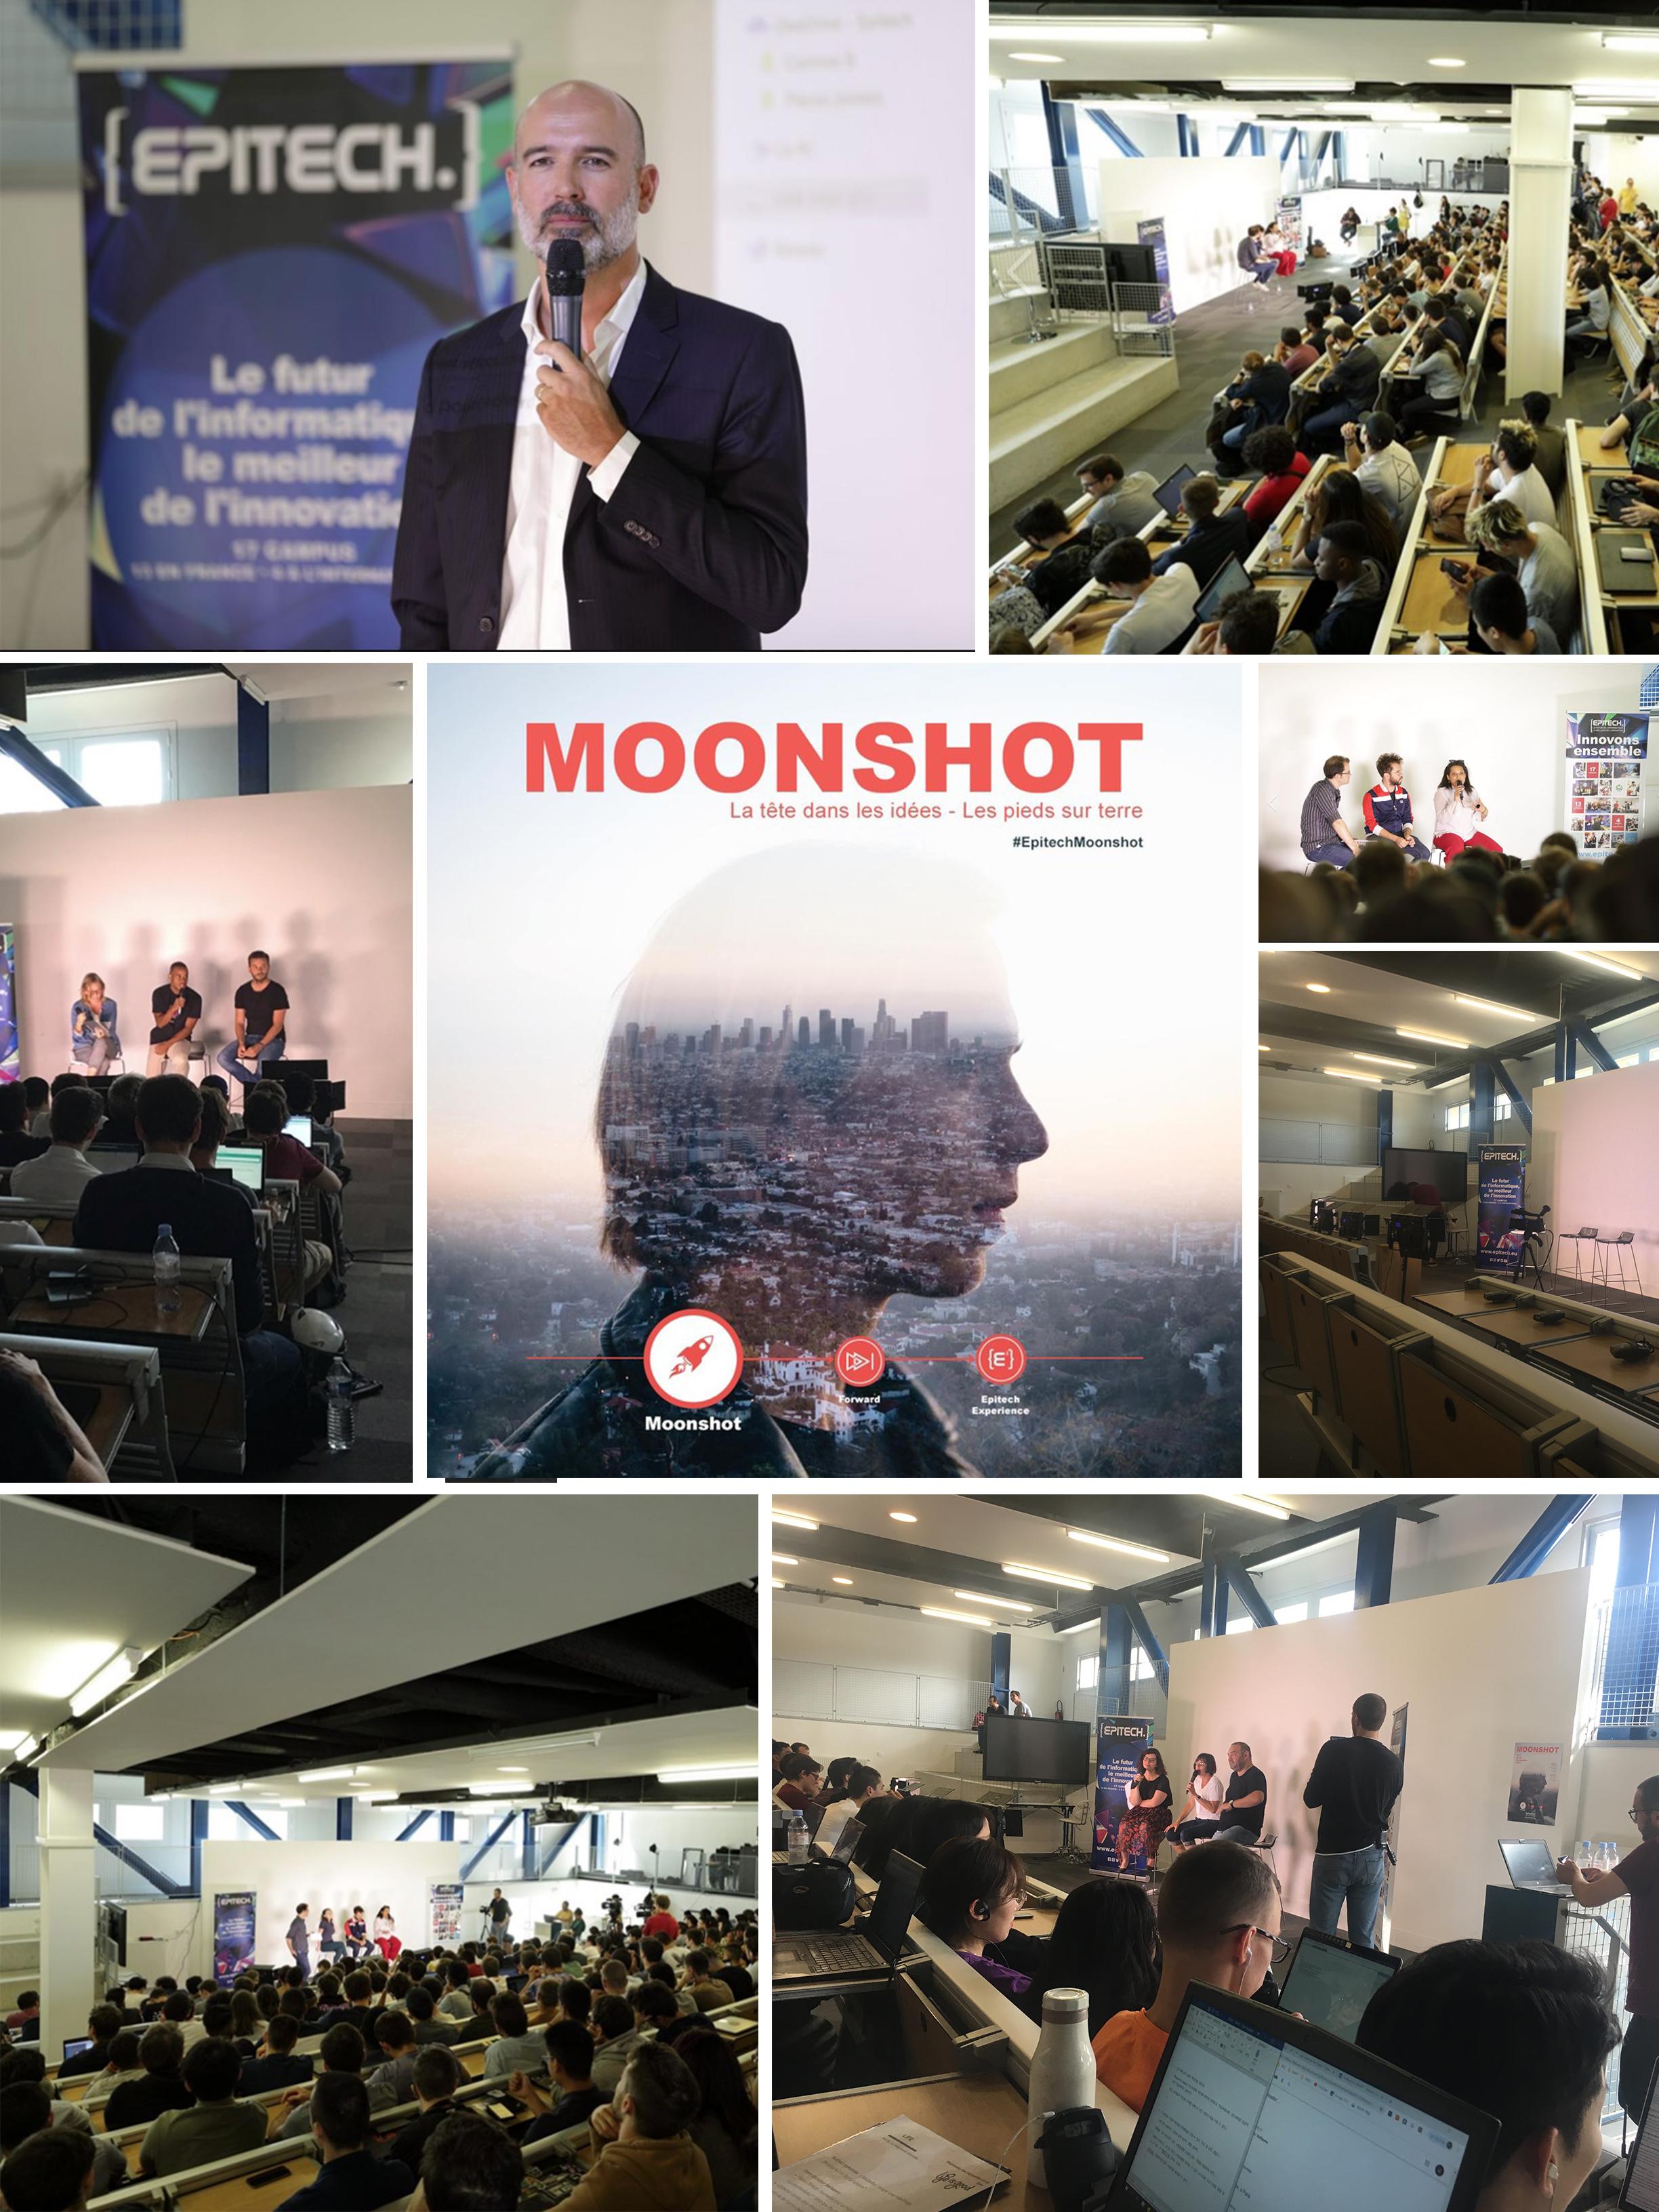 Epitech Moonshot